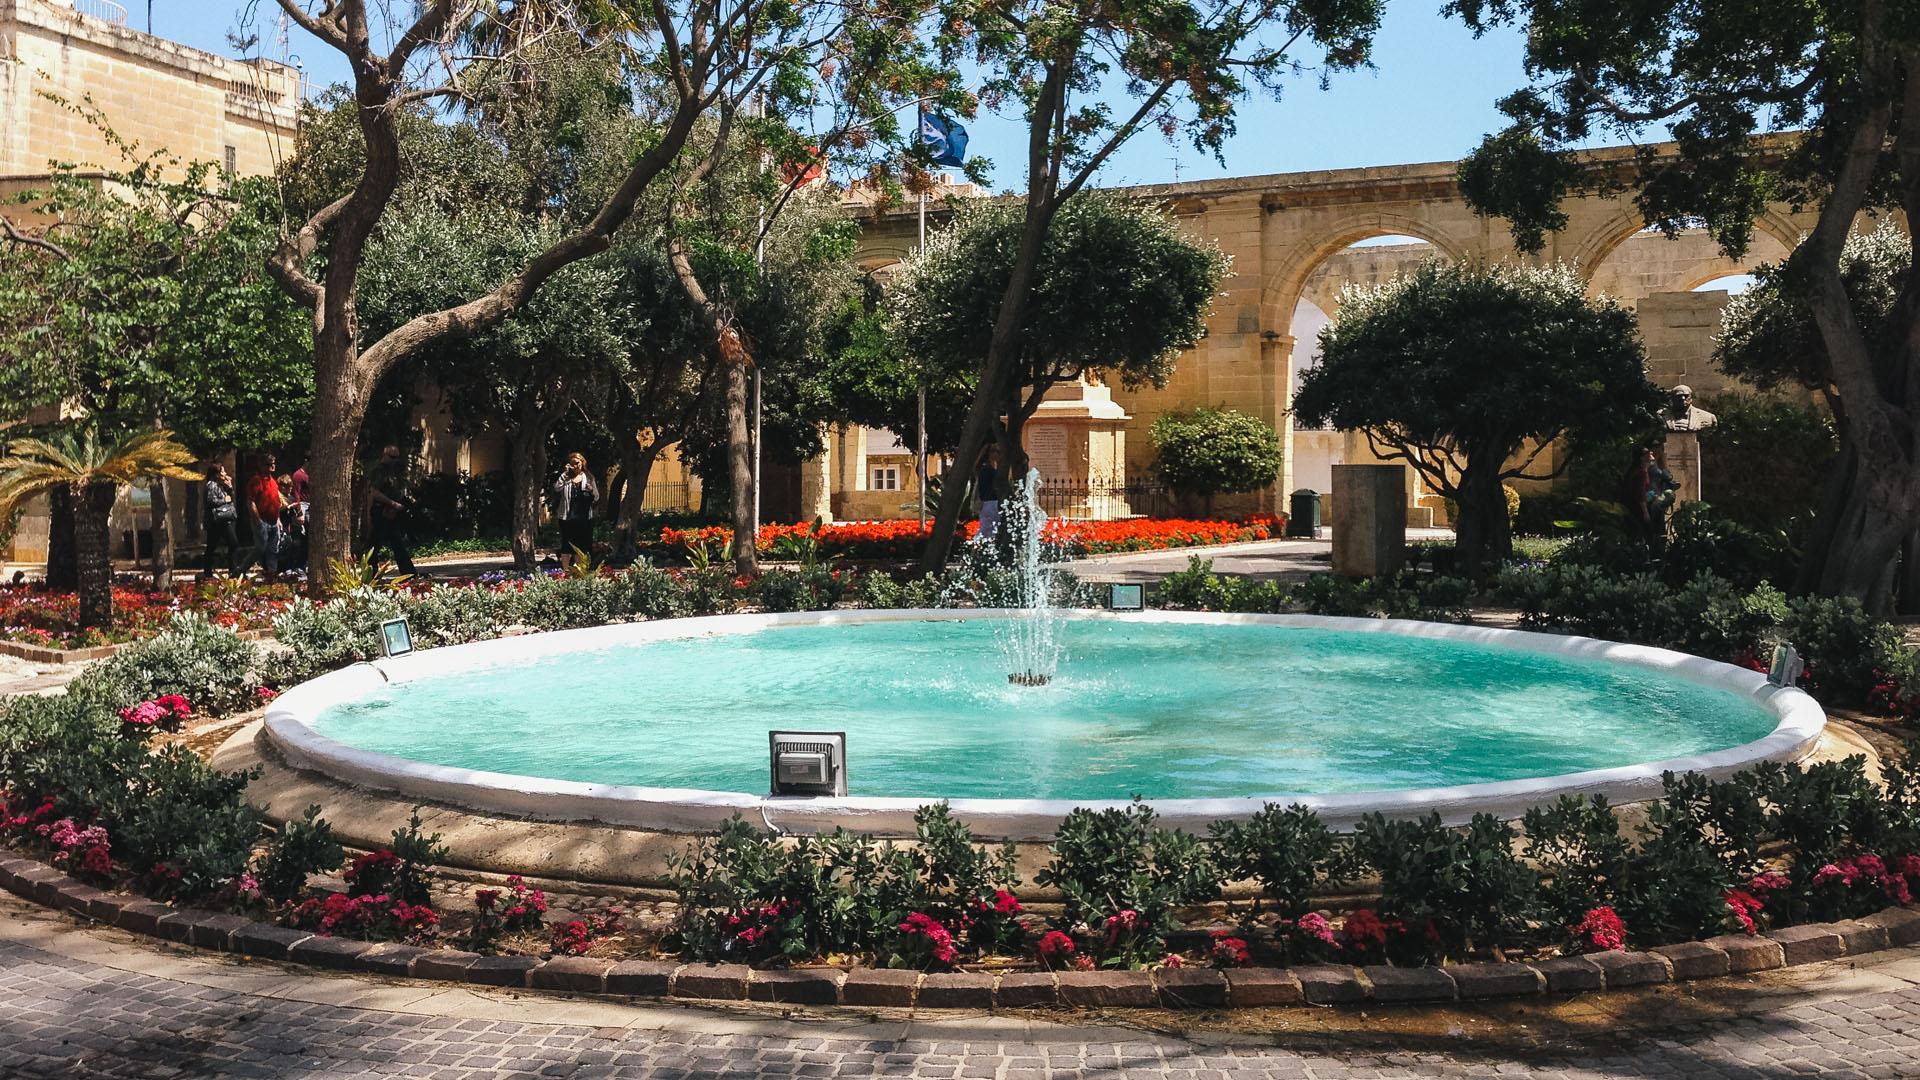 Jardins de La Valette